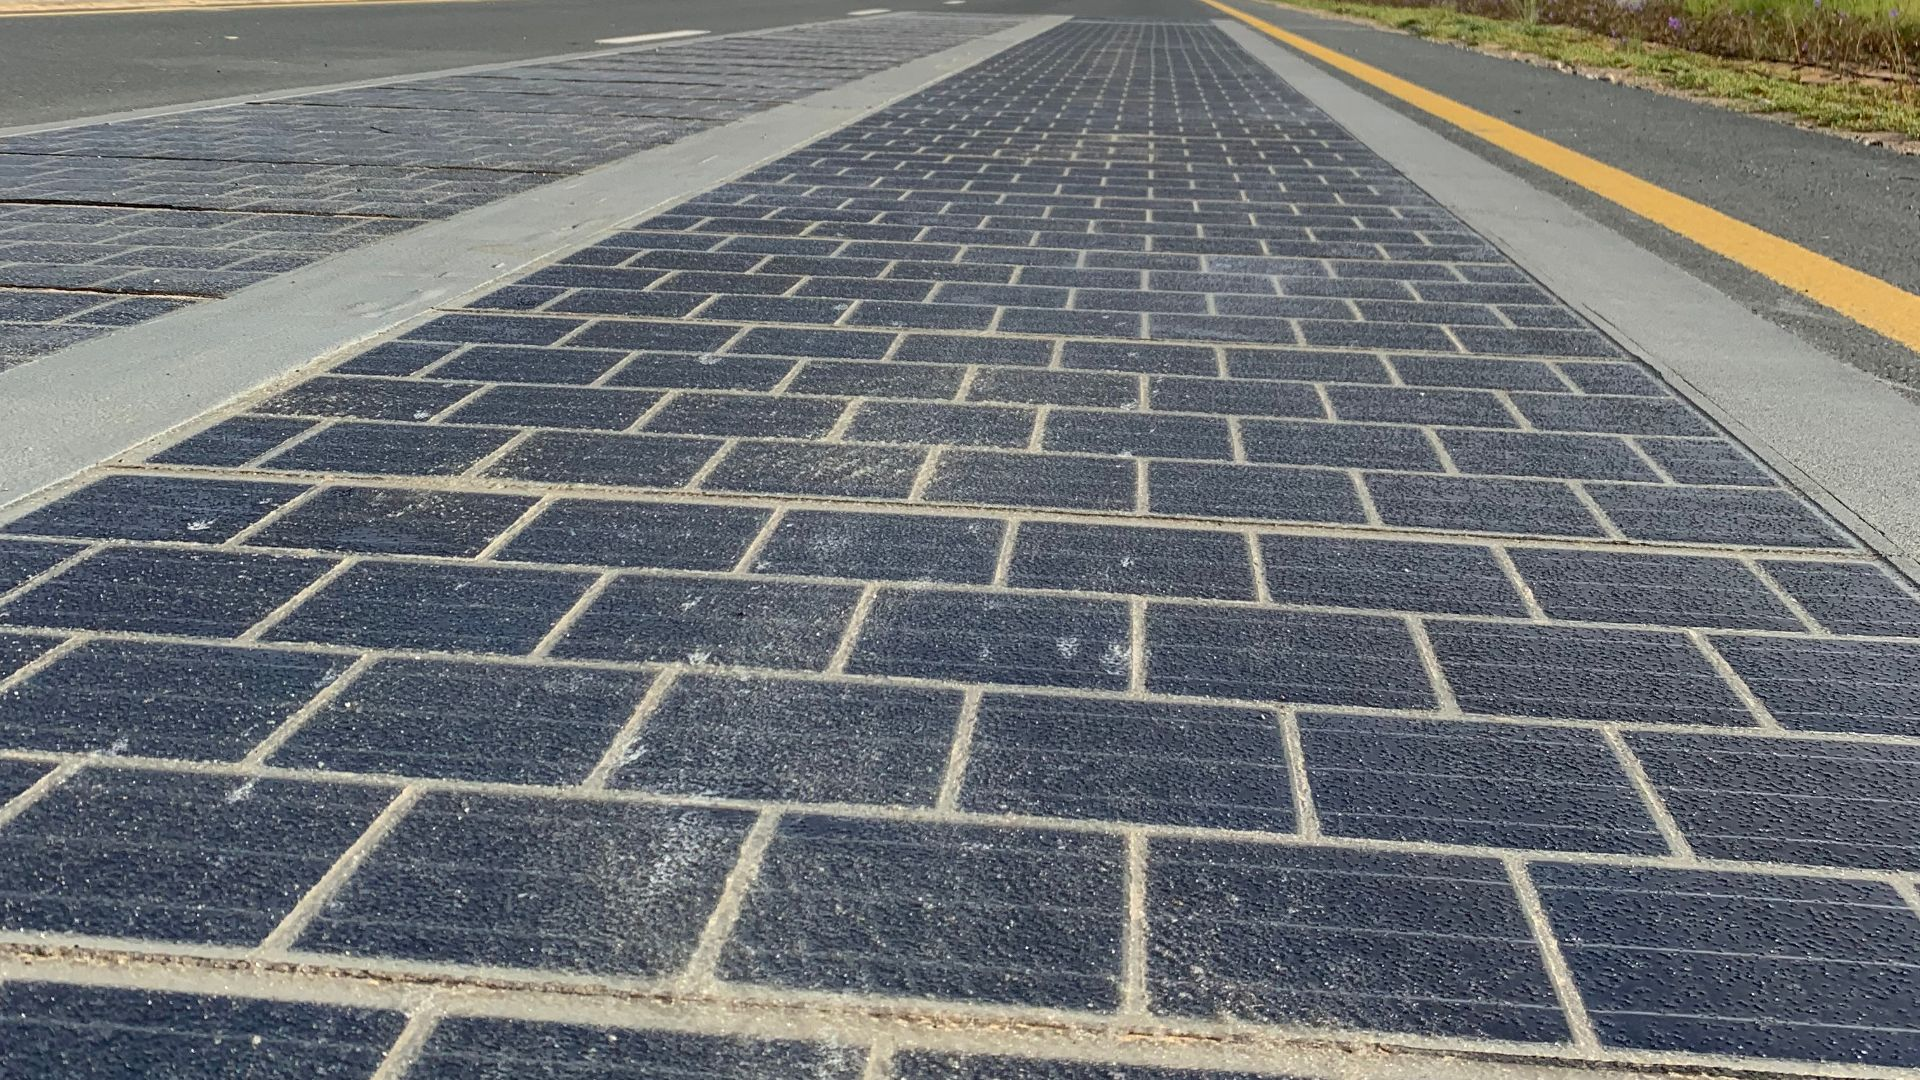 French solar road a failure